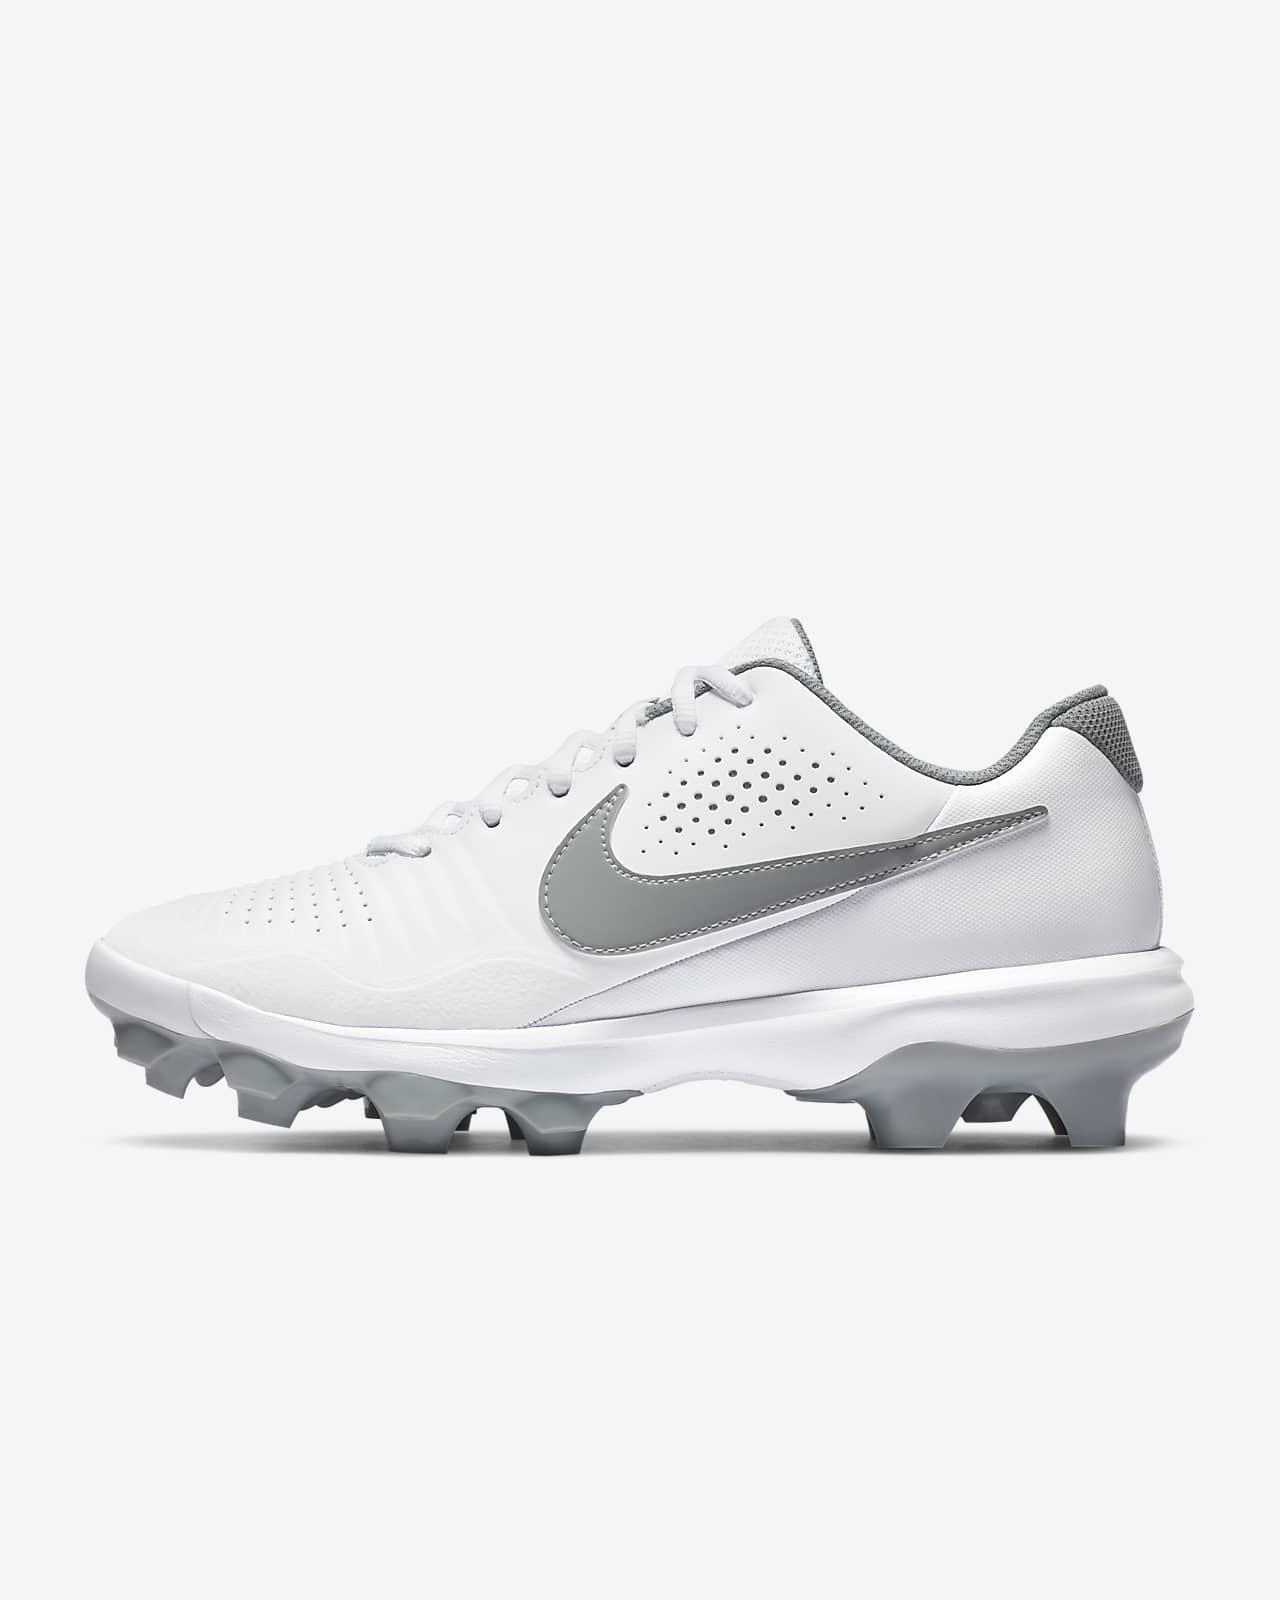 Calzado de béisbol para hombre Nike Alpha Huarache 3 Varsity Low MCS